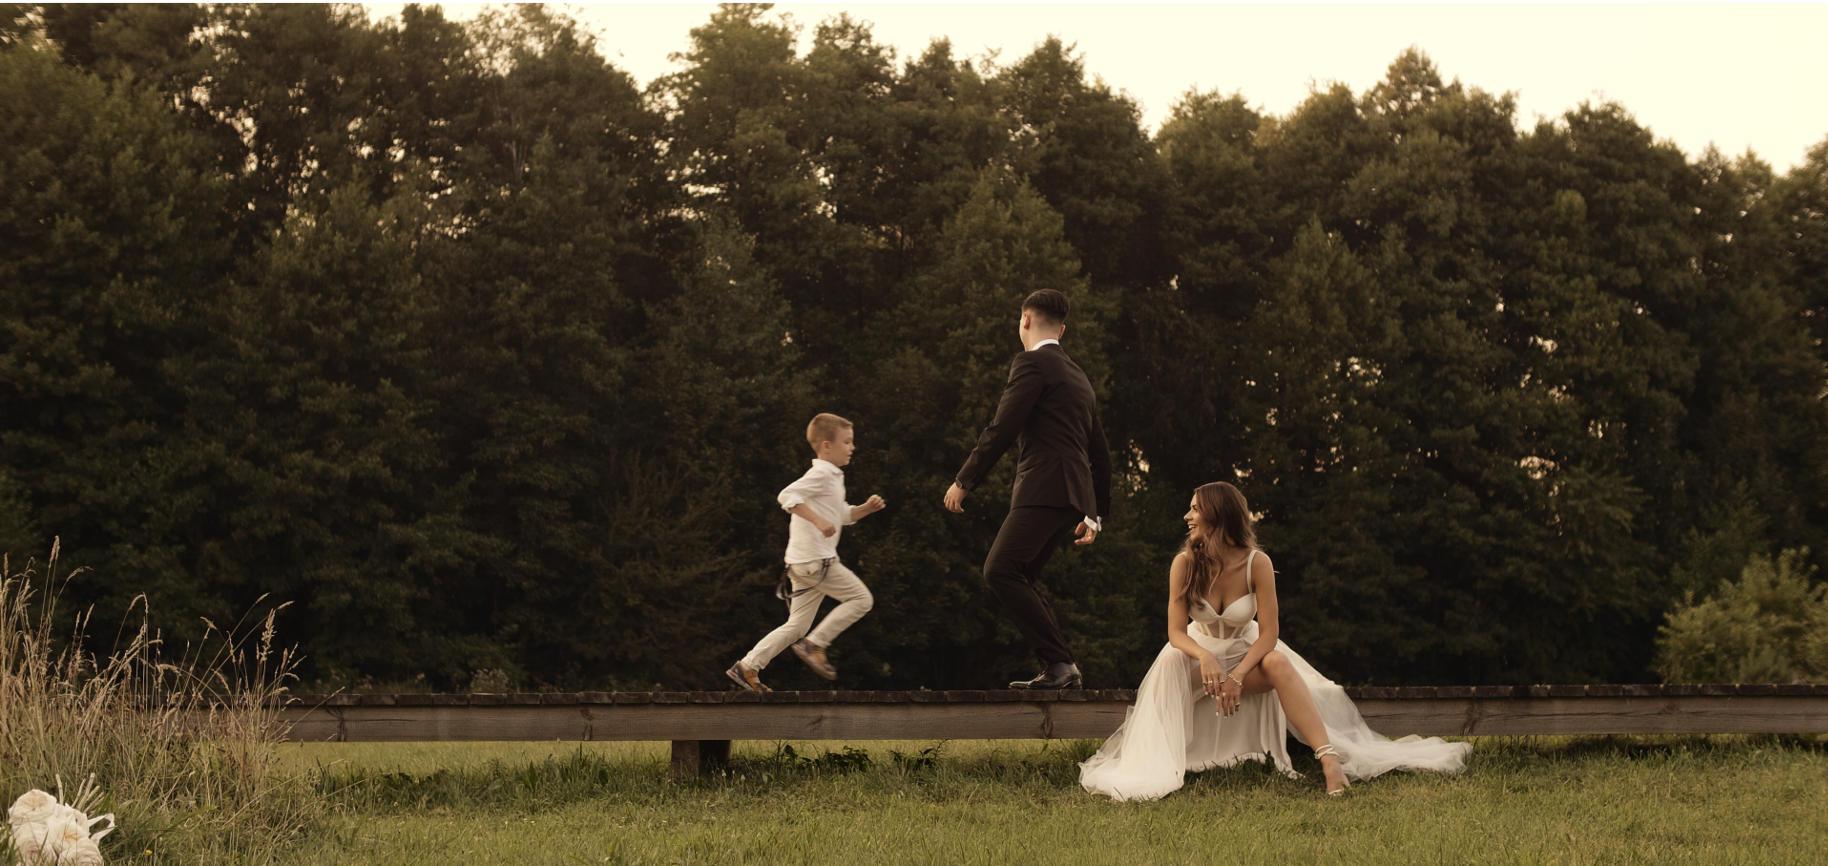 weranda home wedding in poland poznan wedding videography film video